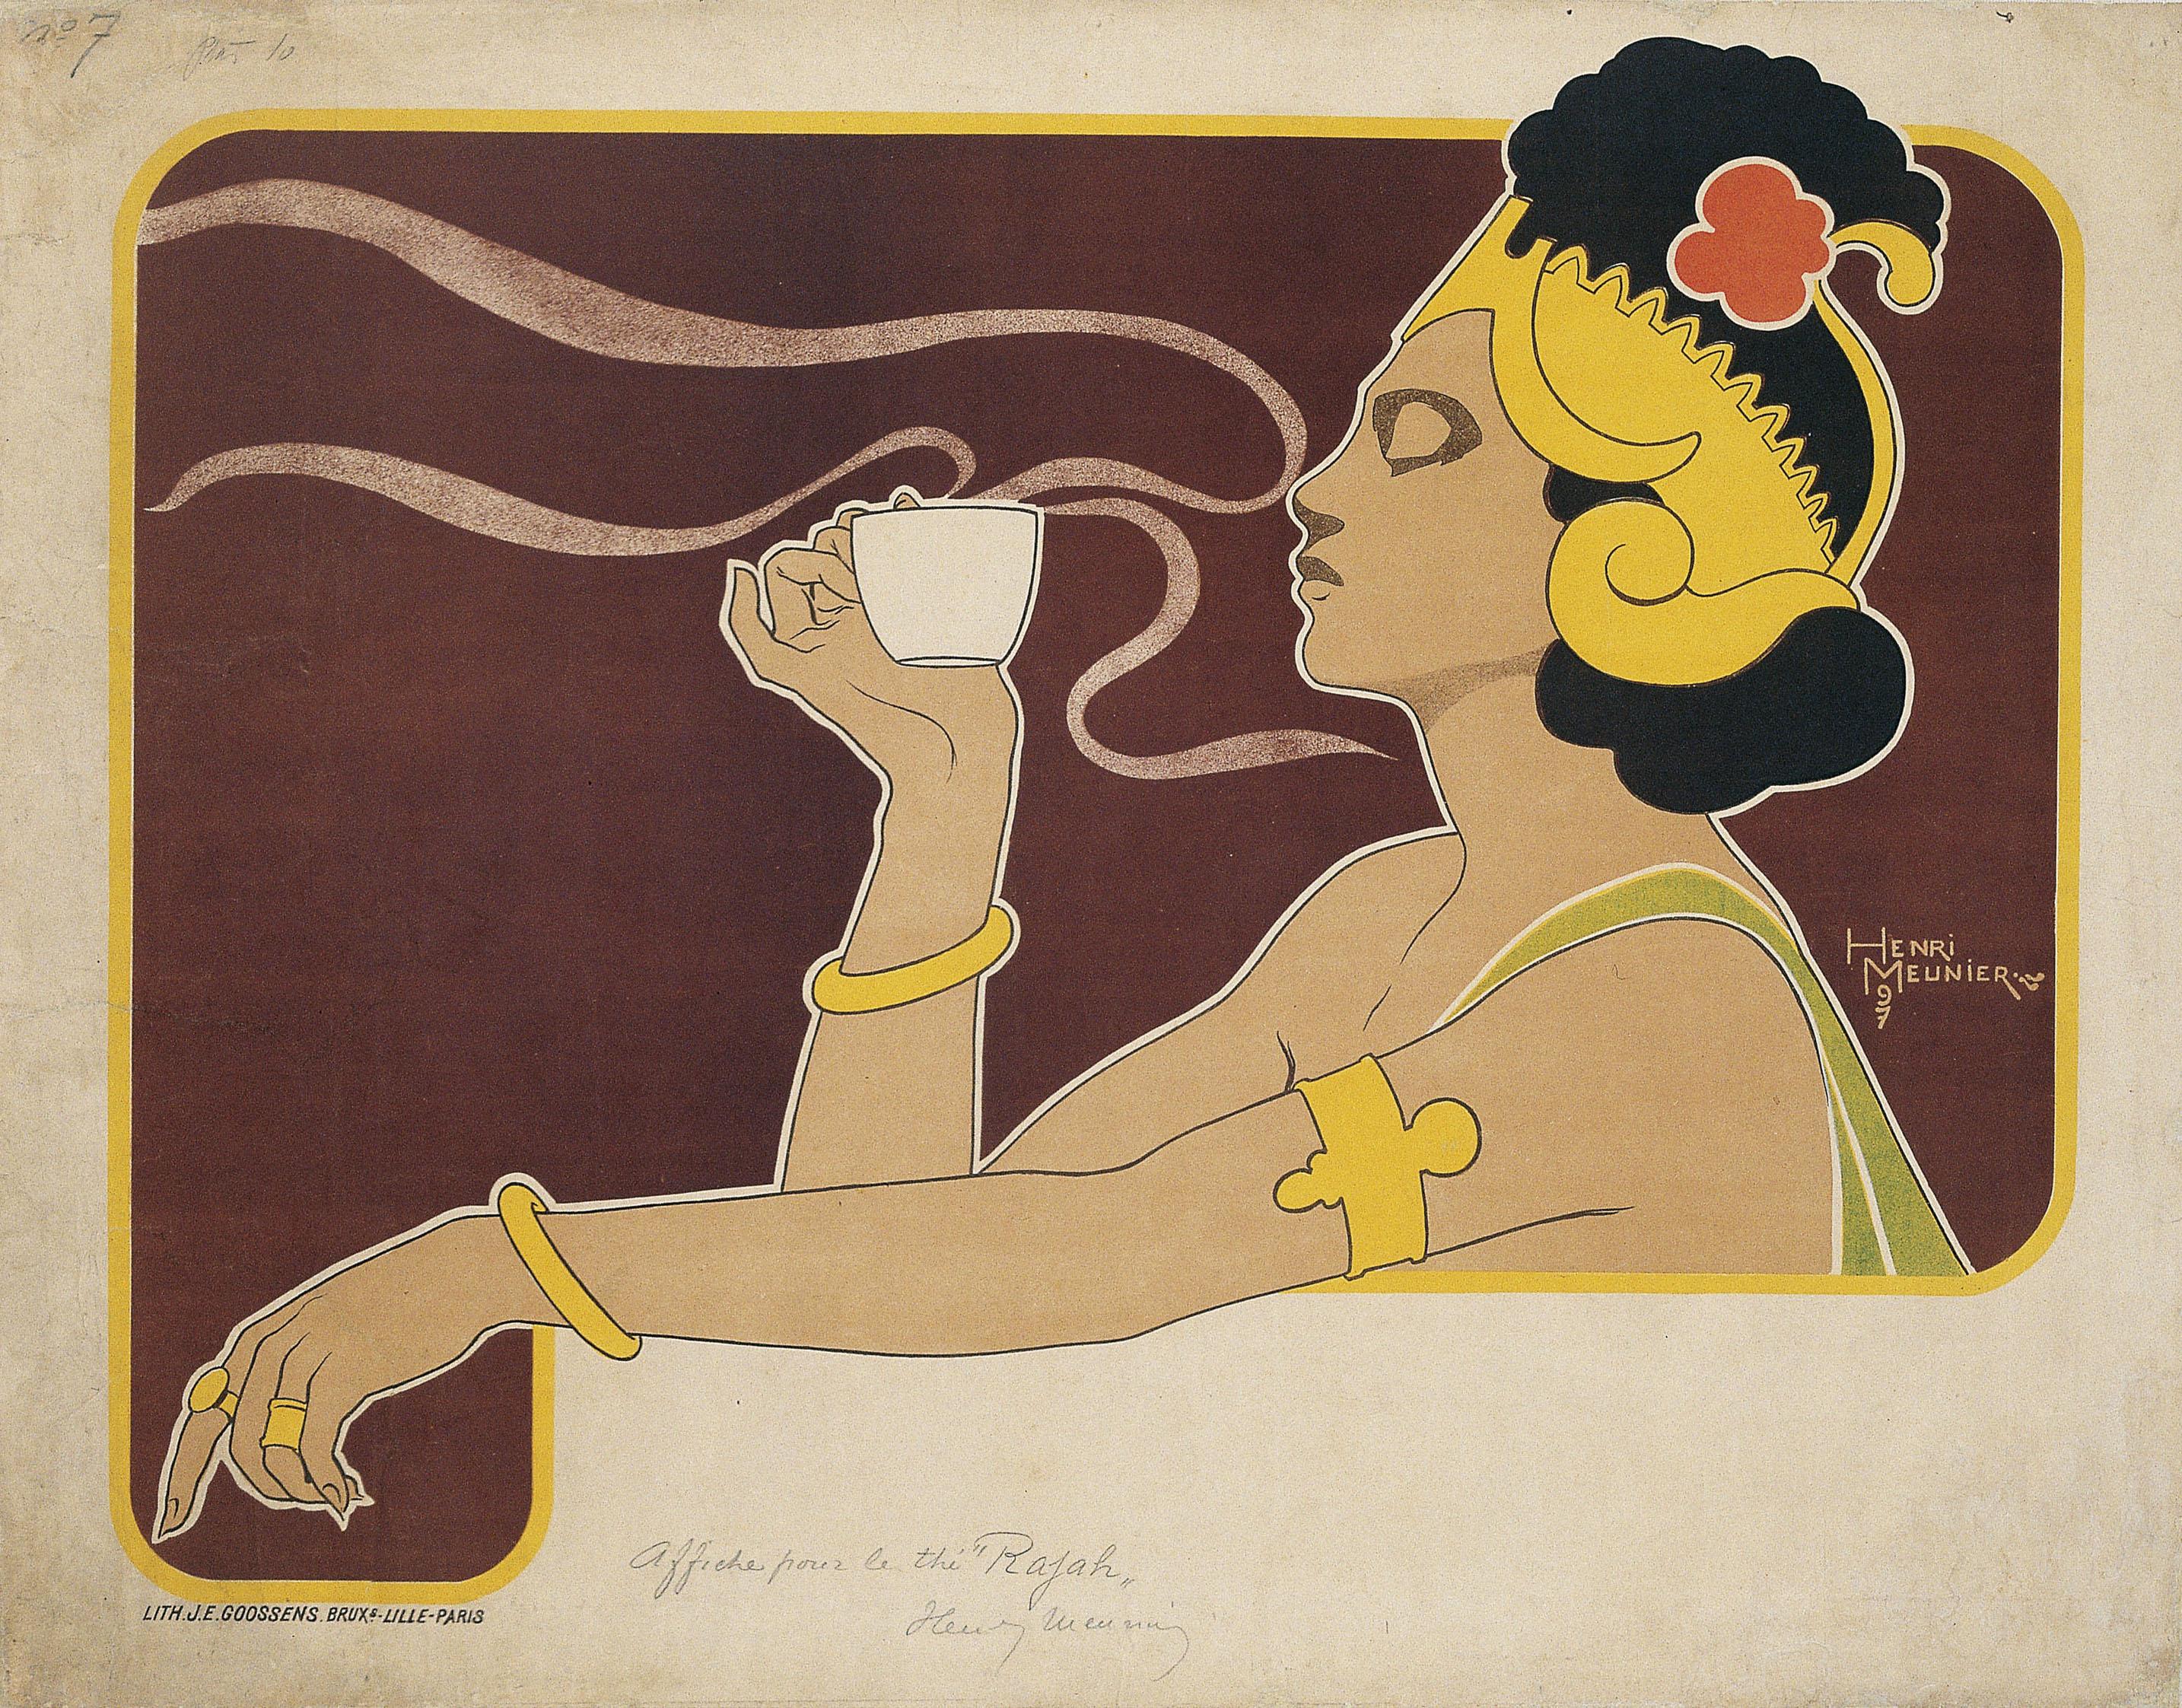 Henri Meunier - Thé Rajah - 1897